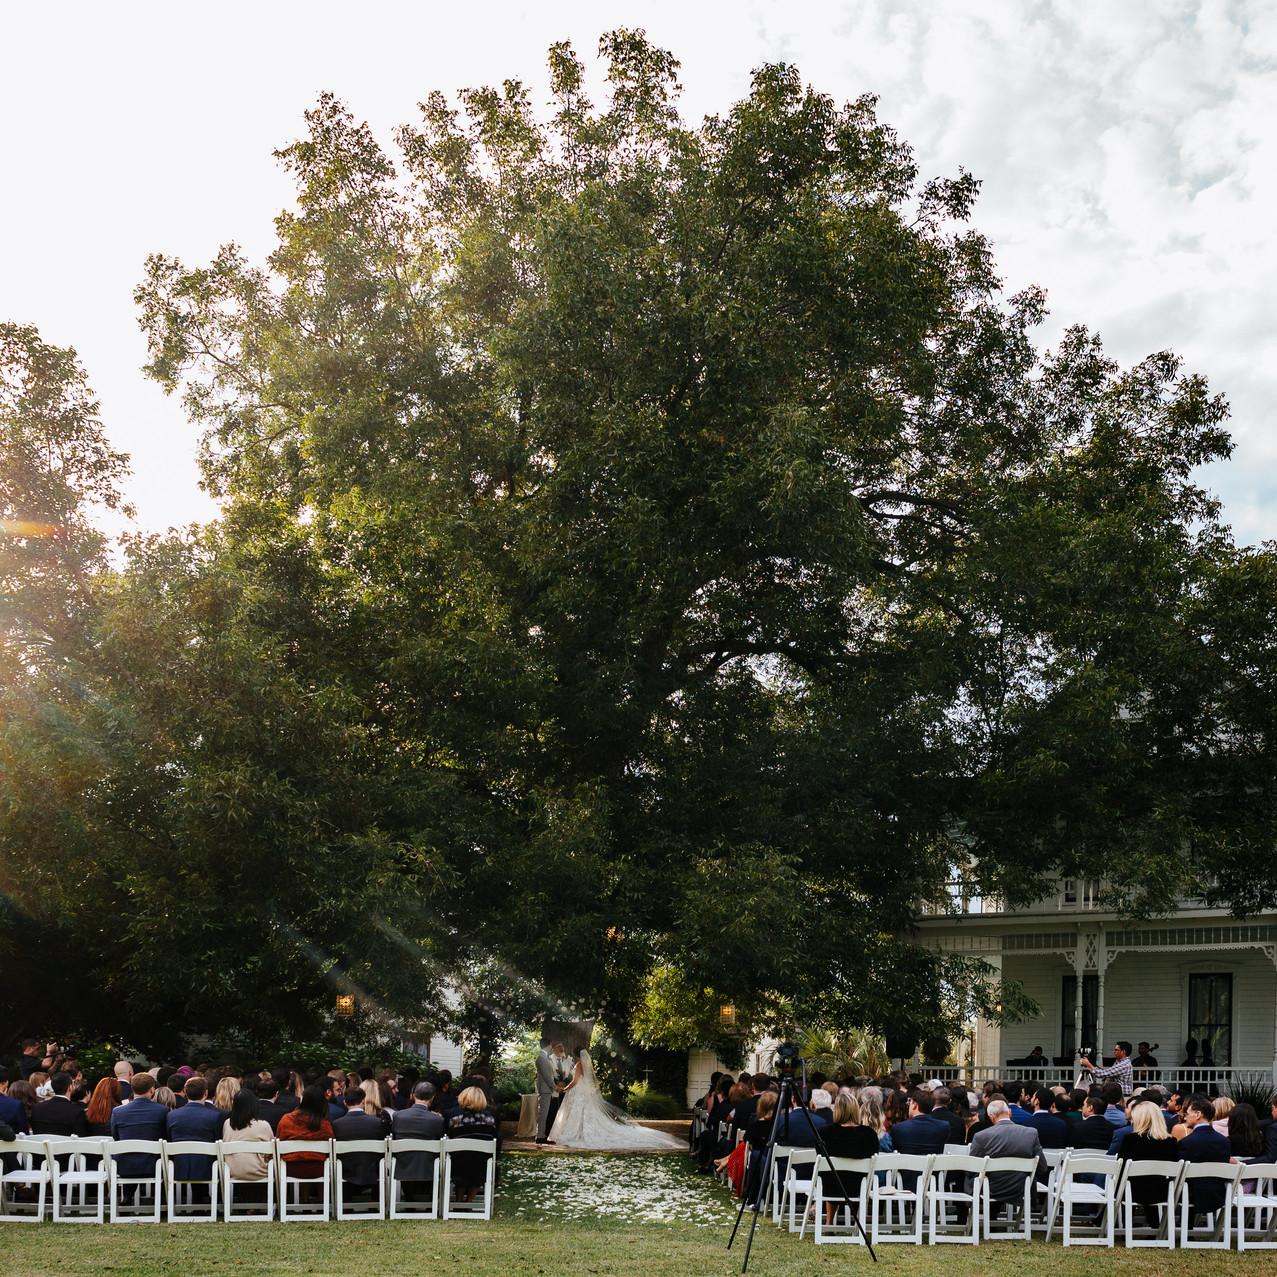 38-Ozer-Gati Wedding-Barr Mansion Jewish